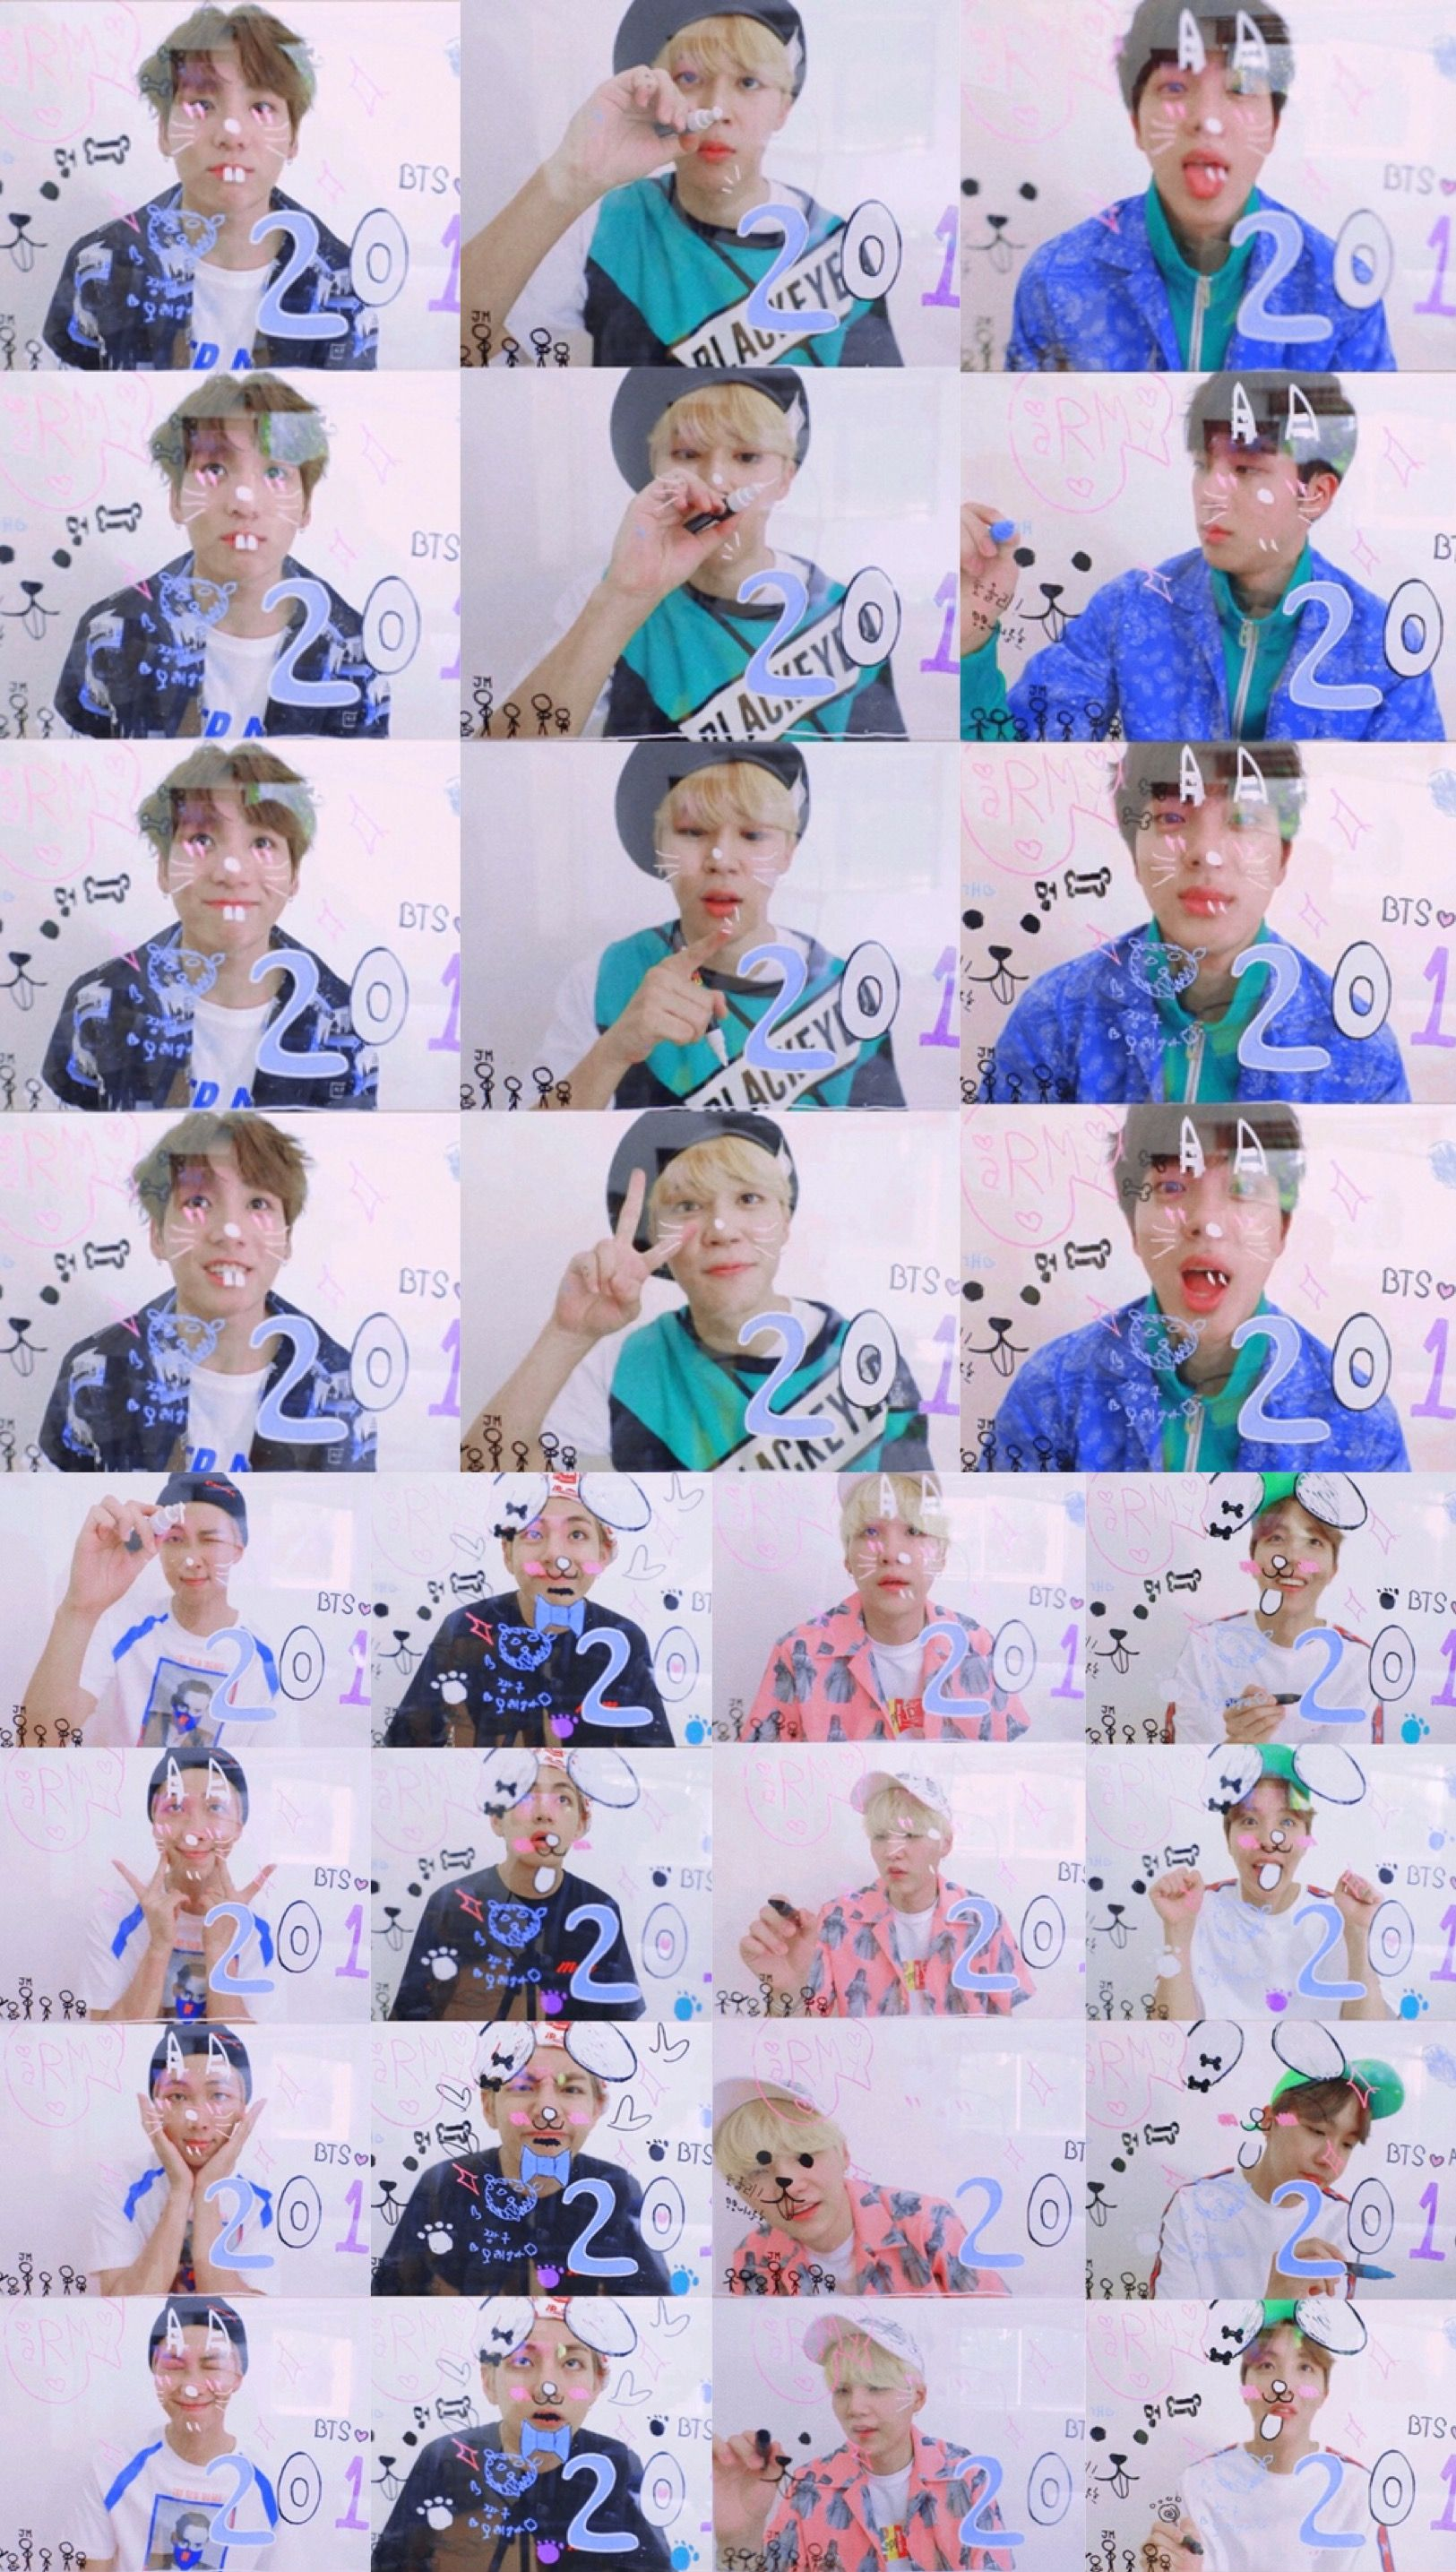 Cute Dance Wallpapers Btsarmy ️ ♡ Bts 2018 Season S Greetings Bts